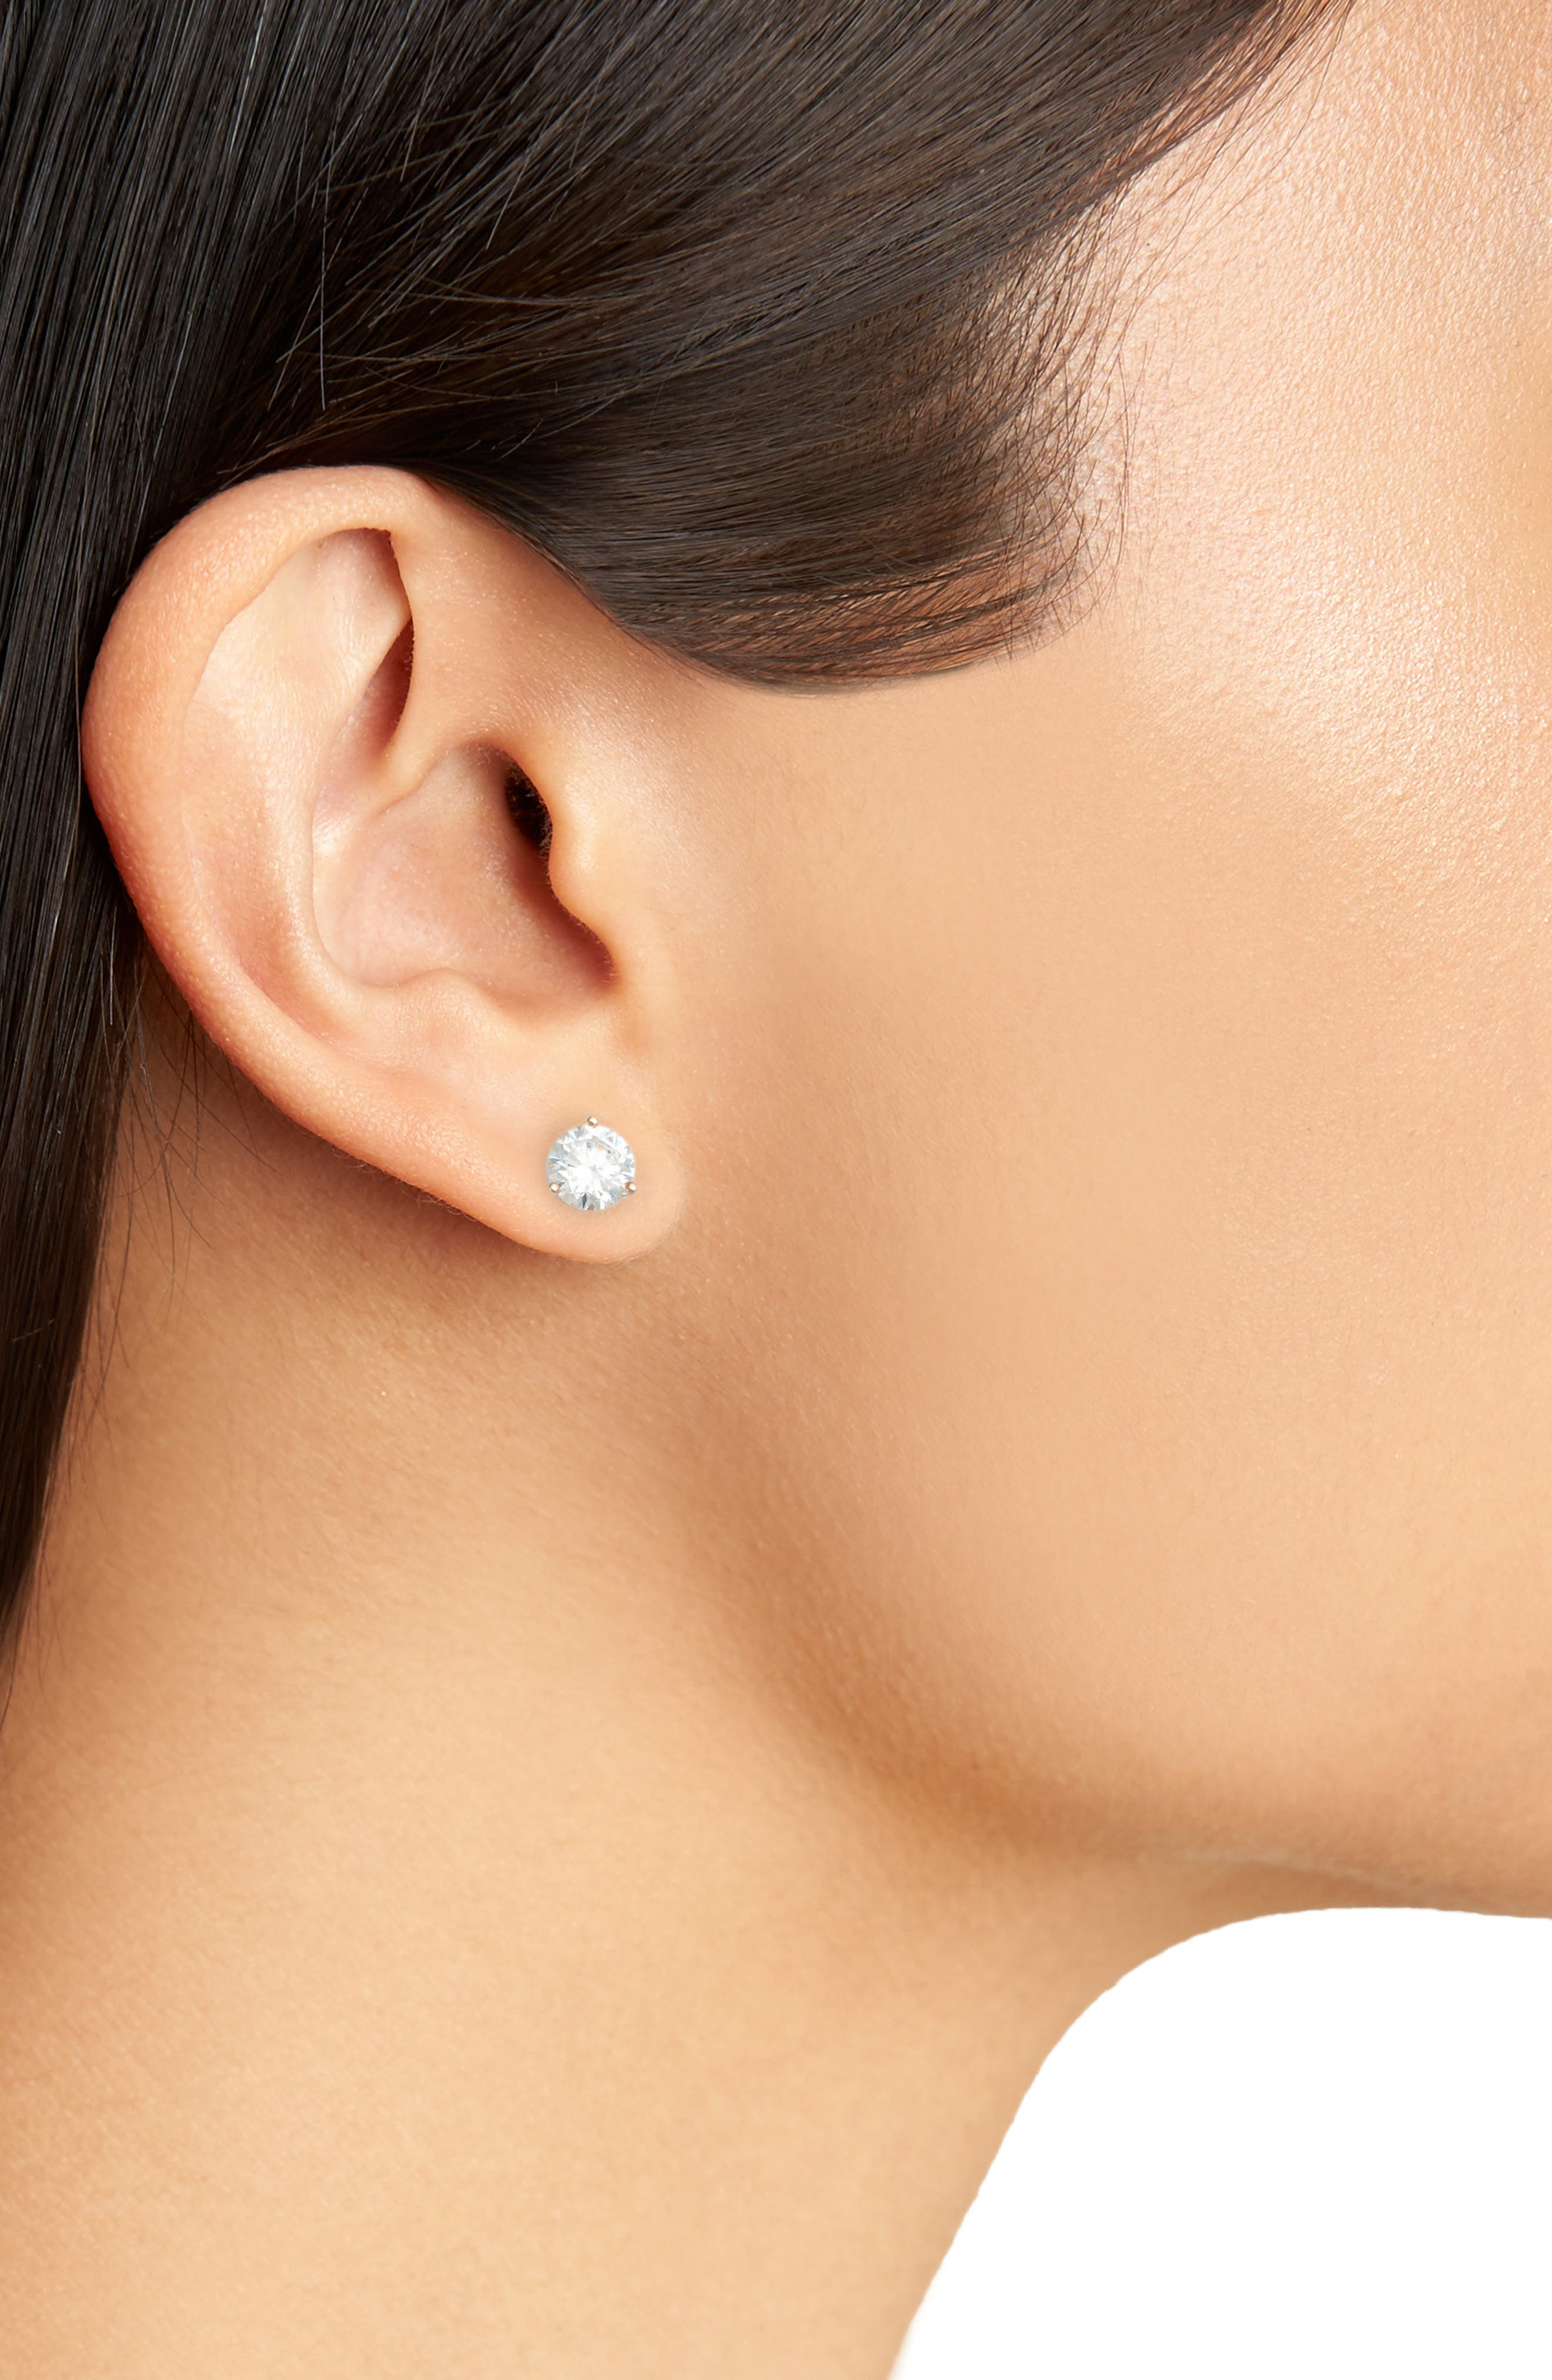 2ct tw Cubic Zirconia Earrings,                             Alternate thumbnail 2, color,                             PLATINUM